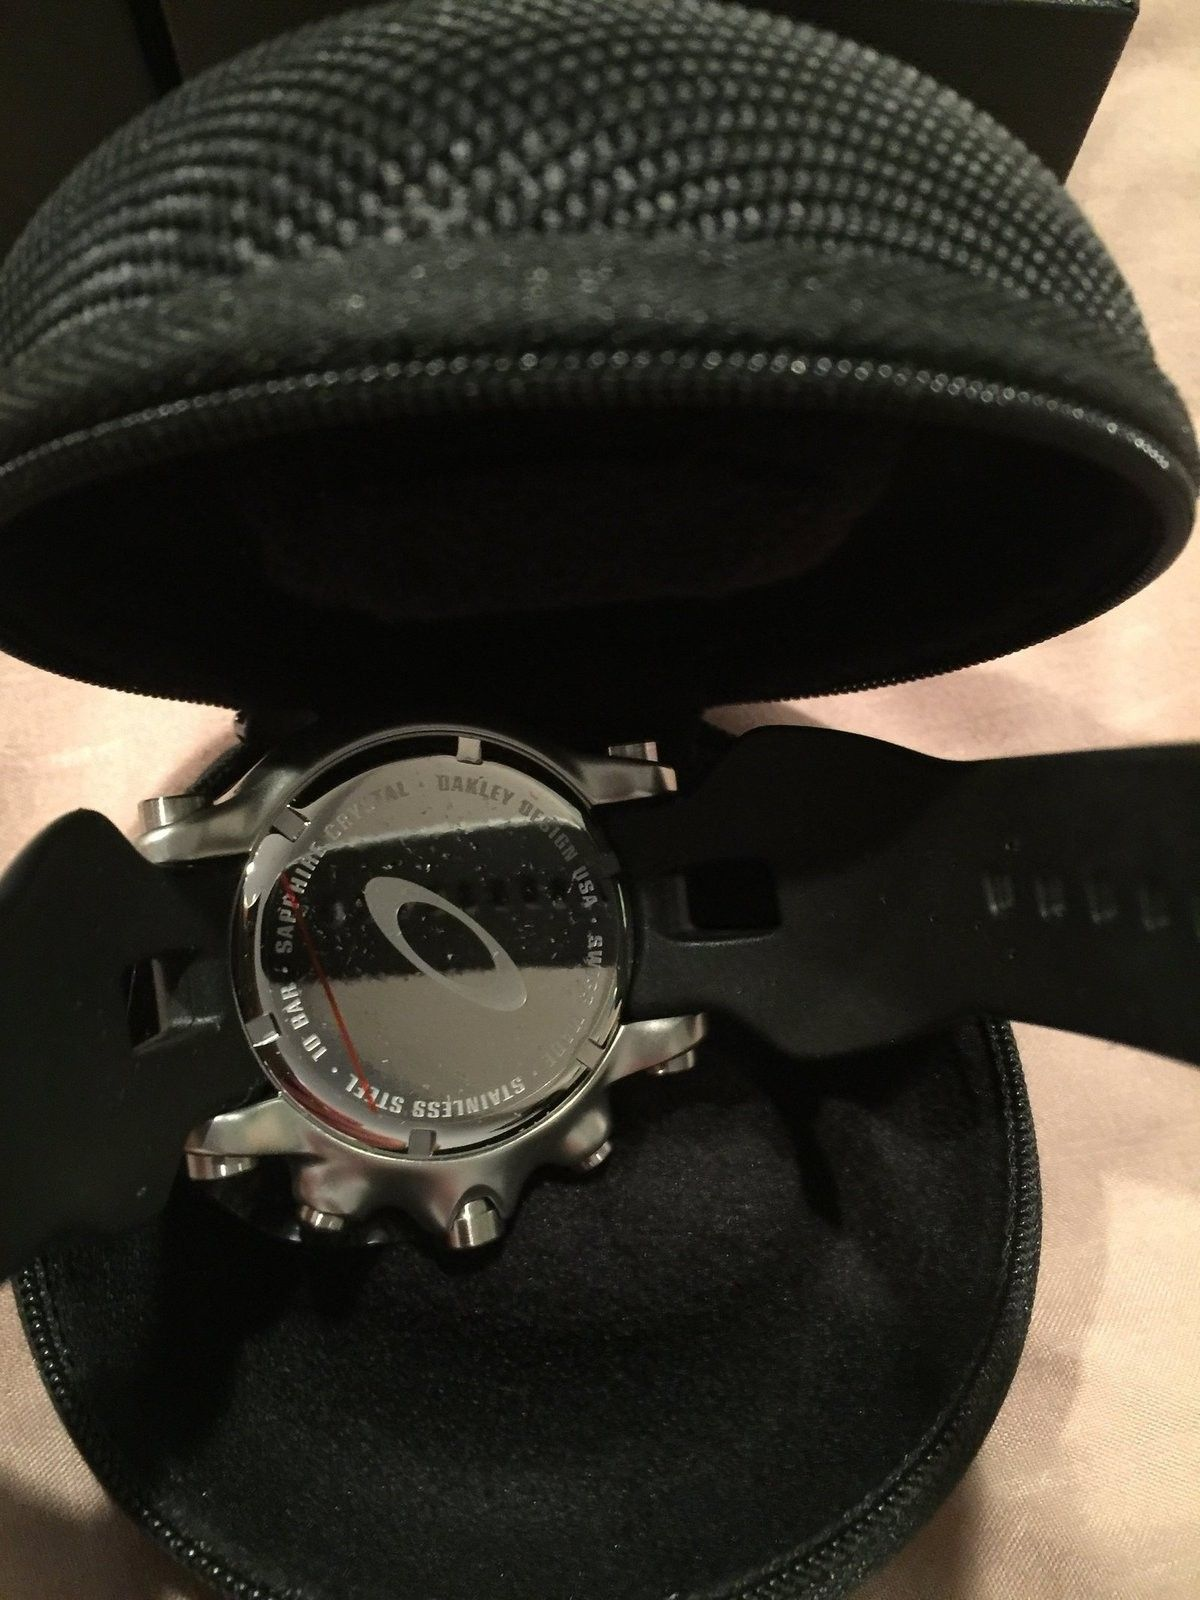 Oakley Men's Holeshot Unobtainium Chronograph Watch w/ Blue Face & Receipt - image.jpeg